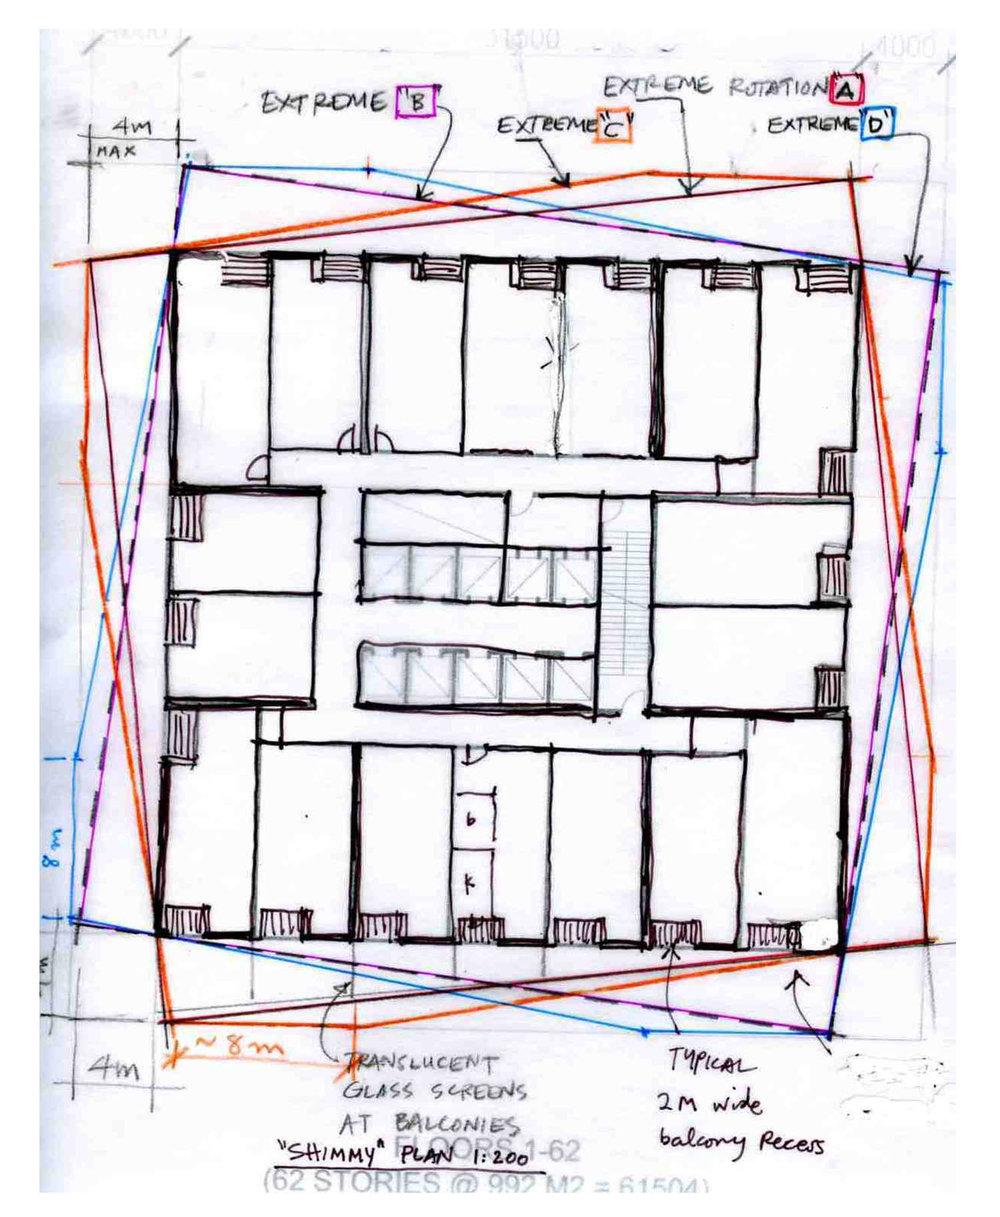 tyt-plan-diagram.jpg